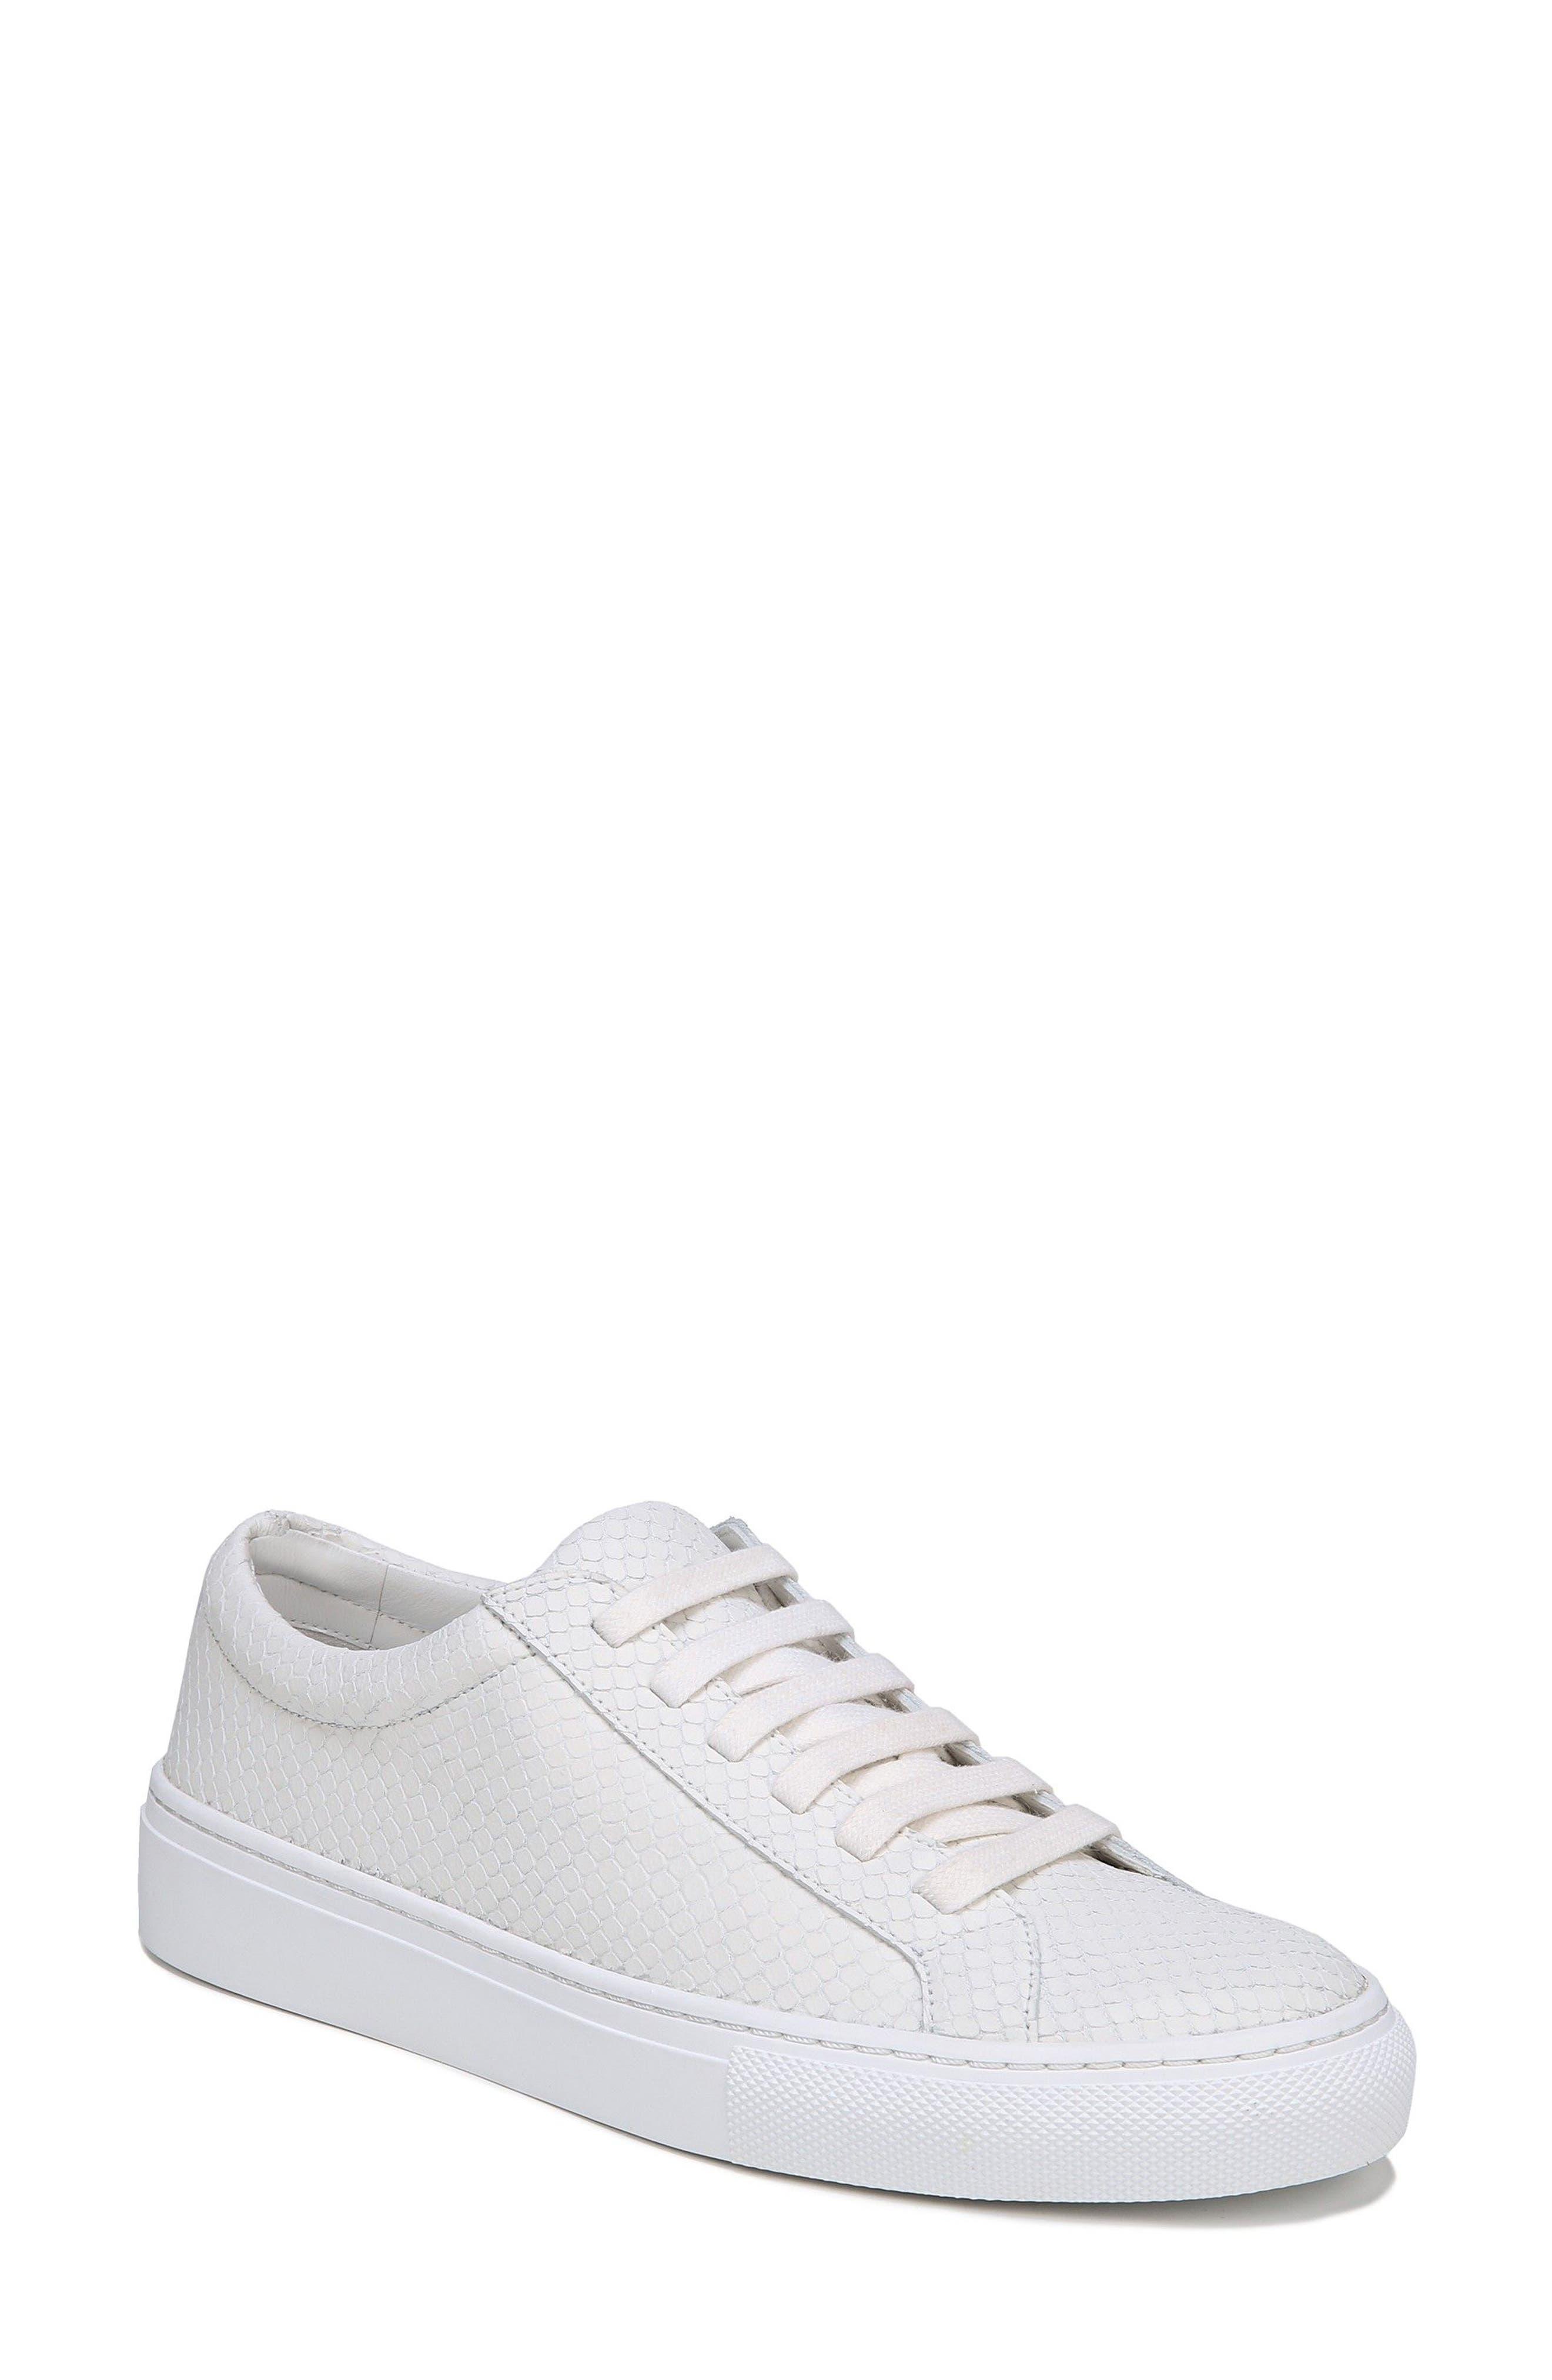 SUIV2 Snake Embossed Sneaker,                         Main,                         color, Porcelain Leather